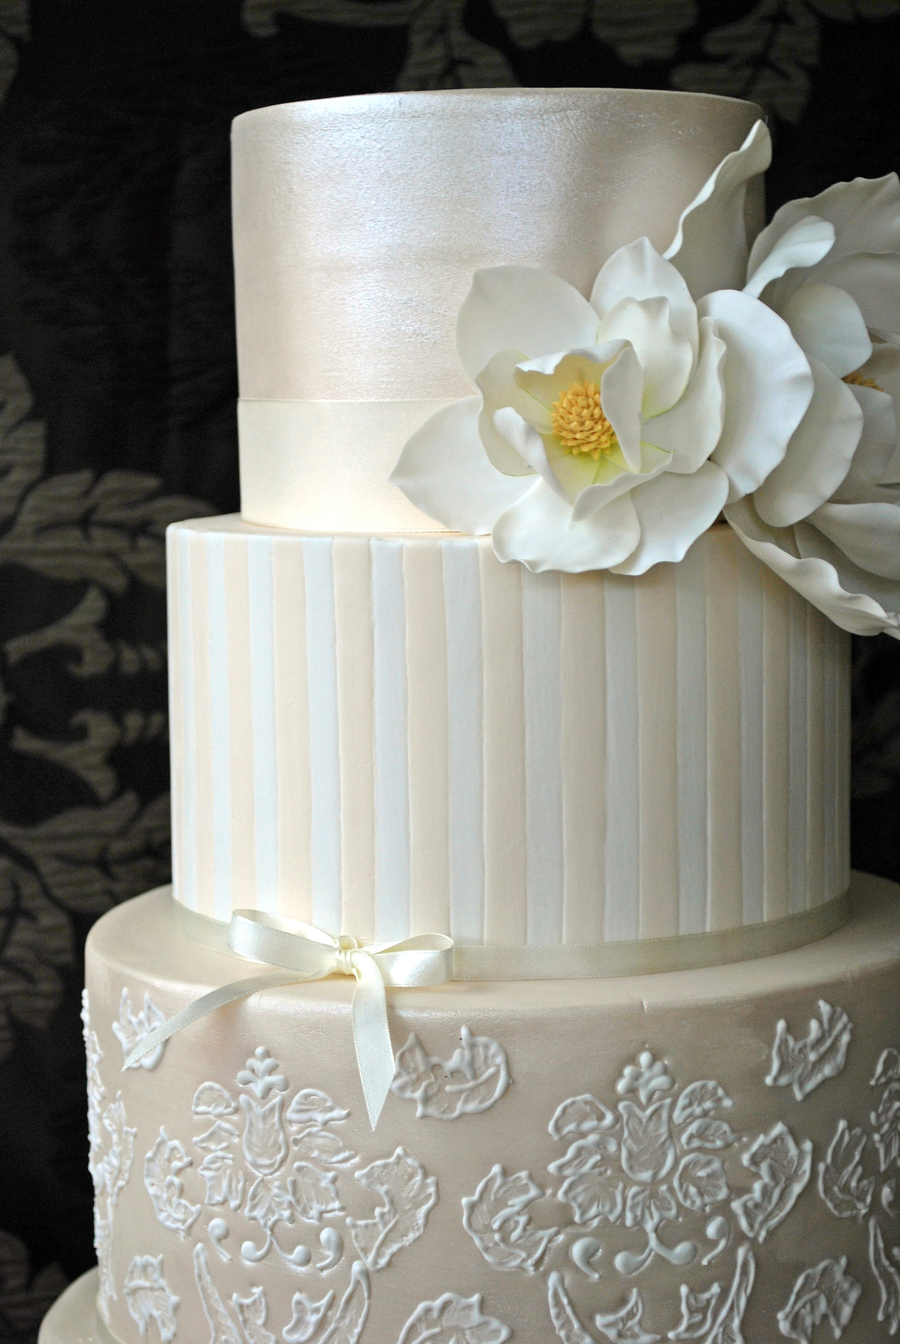 Four Tier Wedding Cake I Made For My Niece Original Idea Is Stunning ...